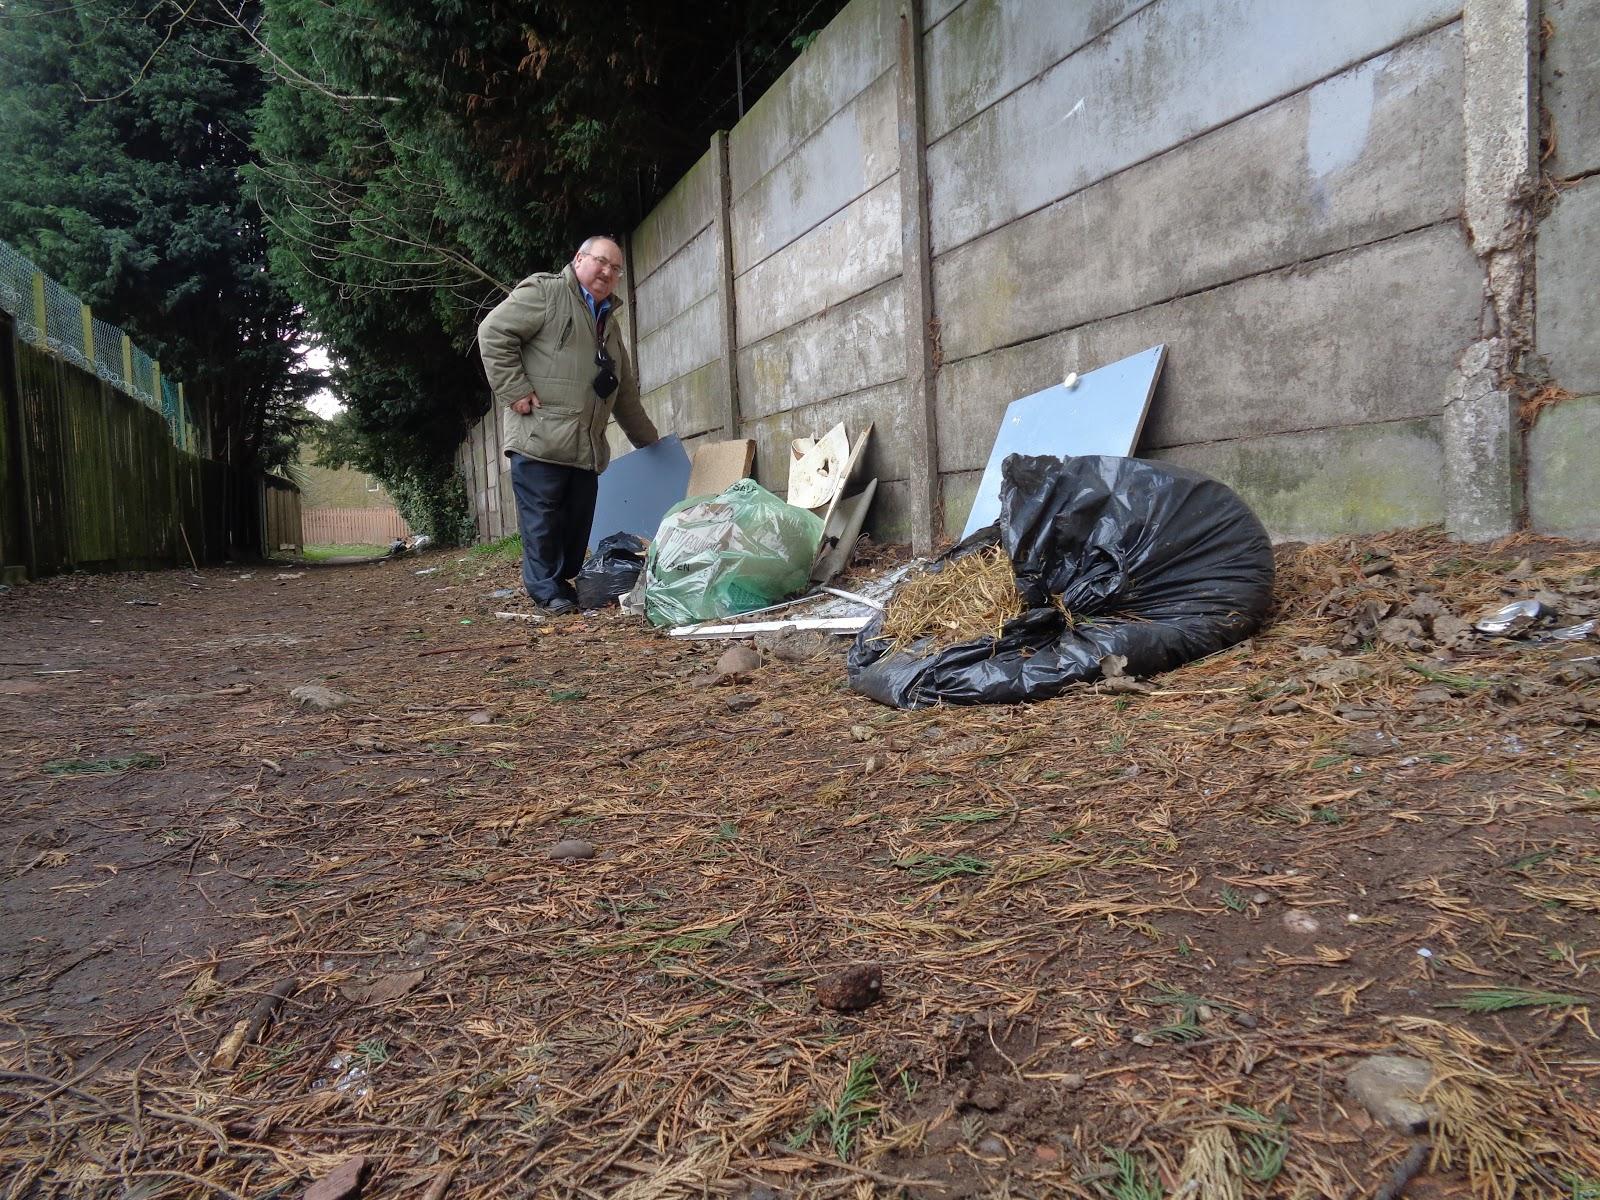 Keith Linnecor - News & Views from Oscott Ward: SADLY ...